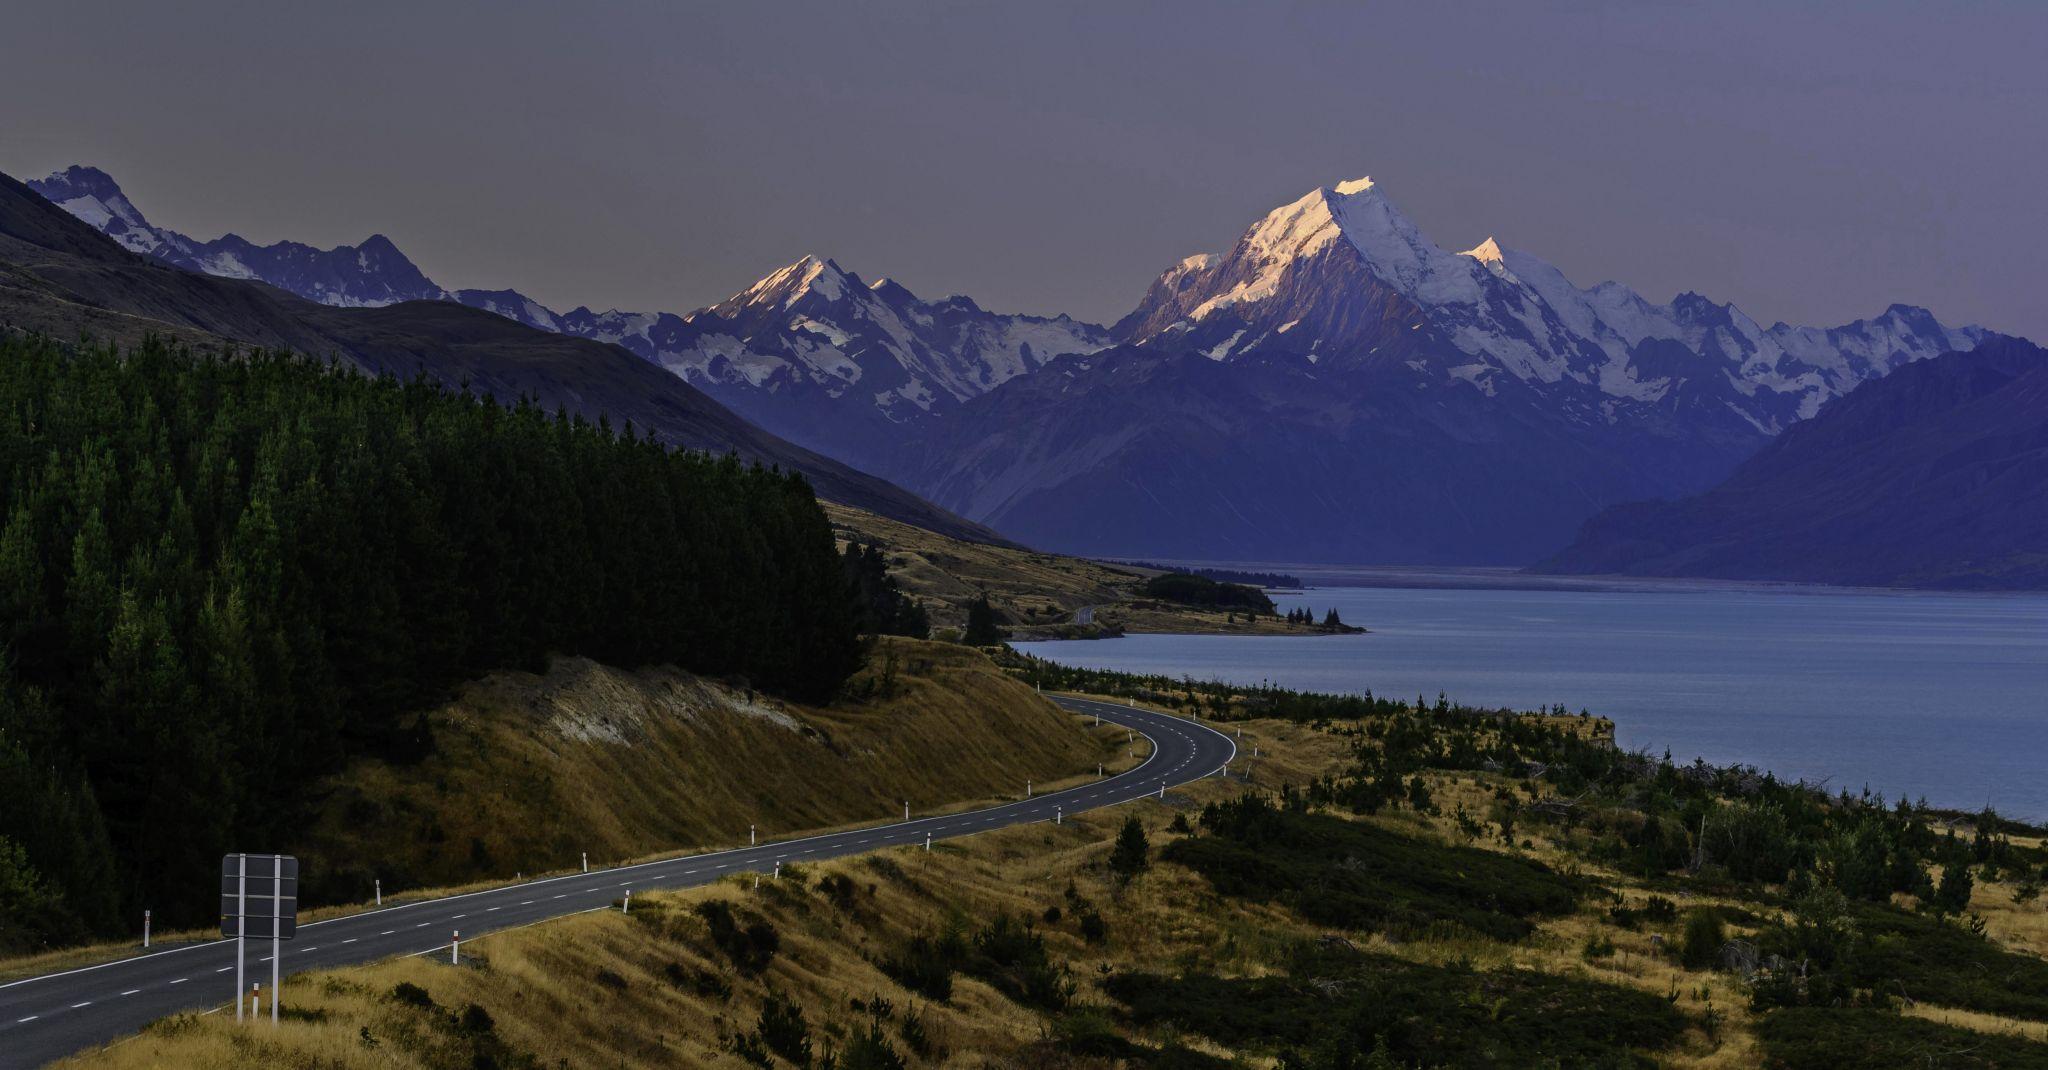 Peter's Lookout 2, New Zealand